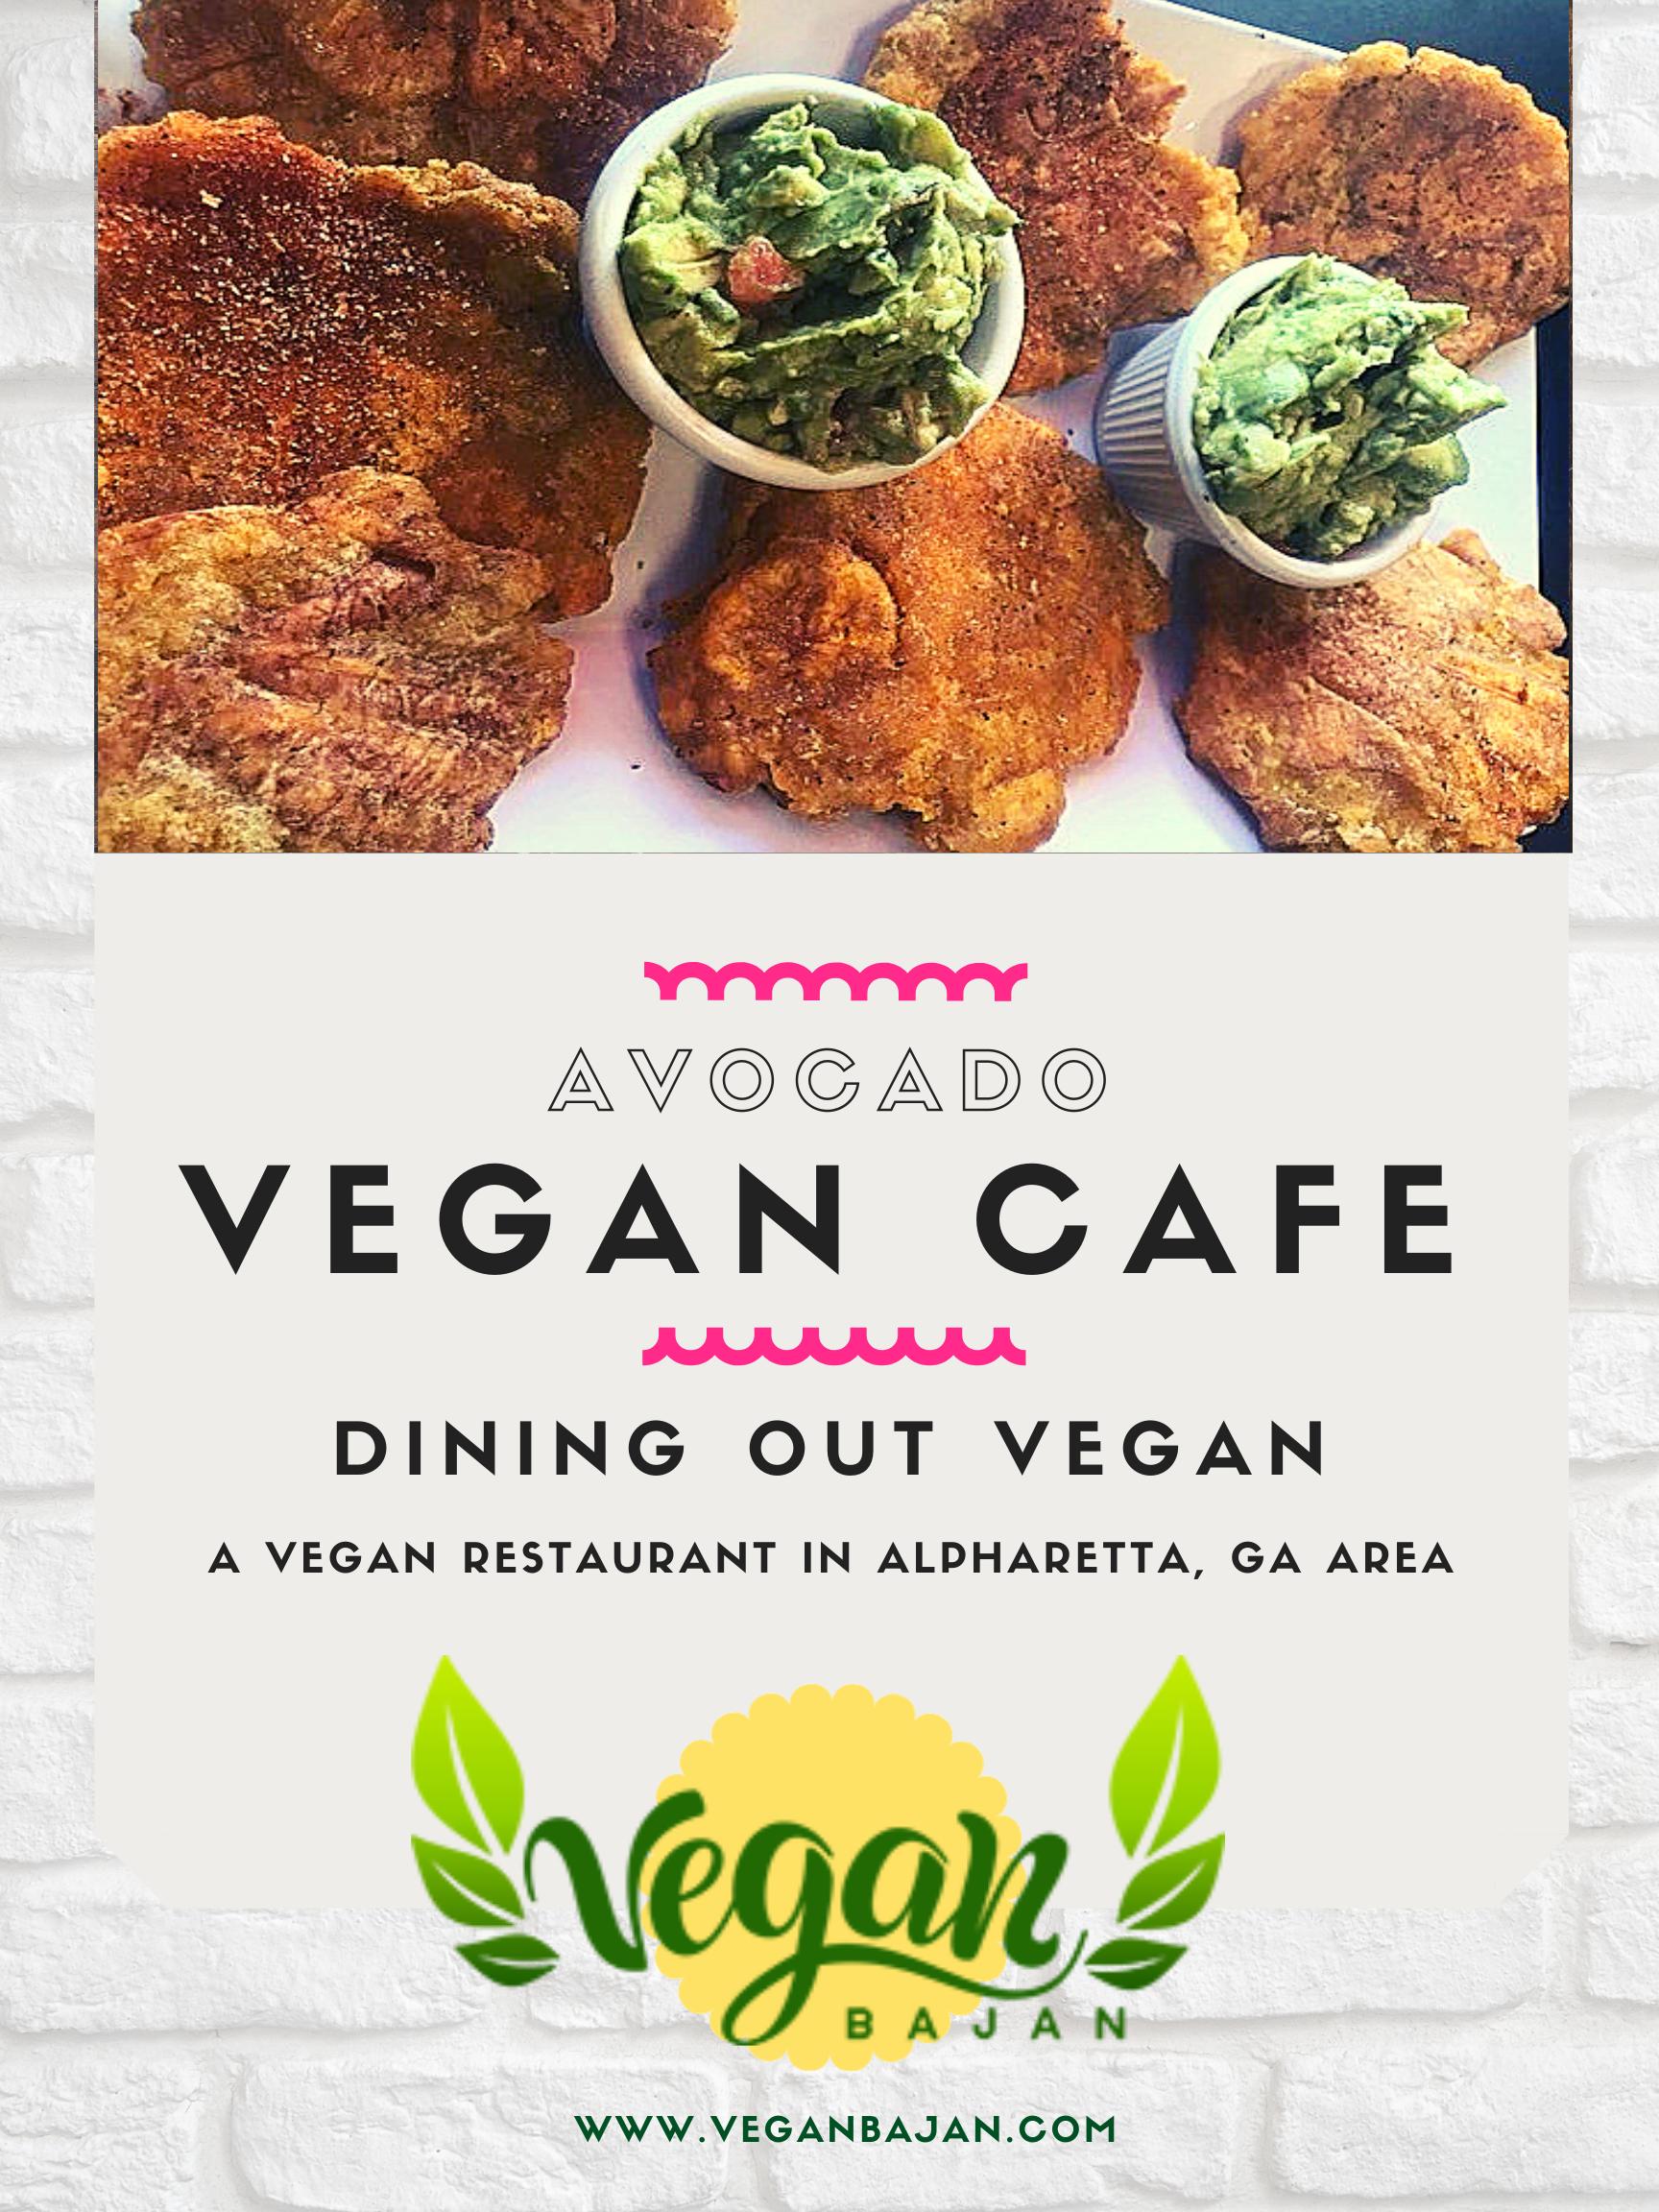 Avocado Vegan Cafe Dining Out Vegan In 2020 Vegan Cafe Avocado Vegan Vegan Restaurants